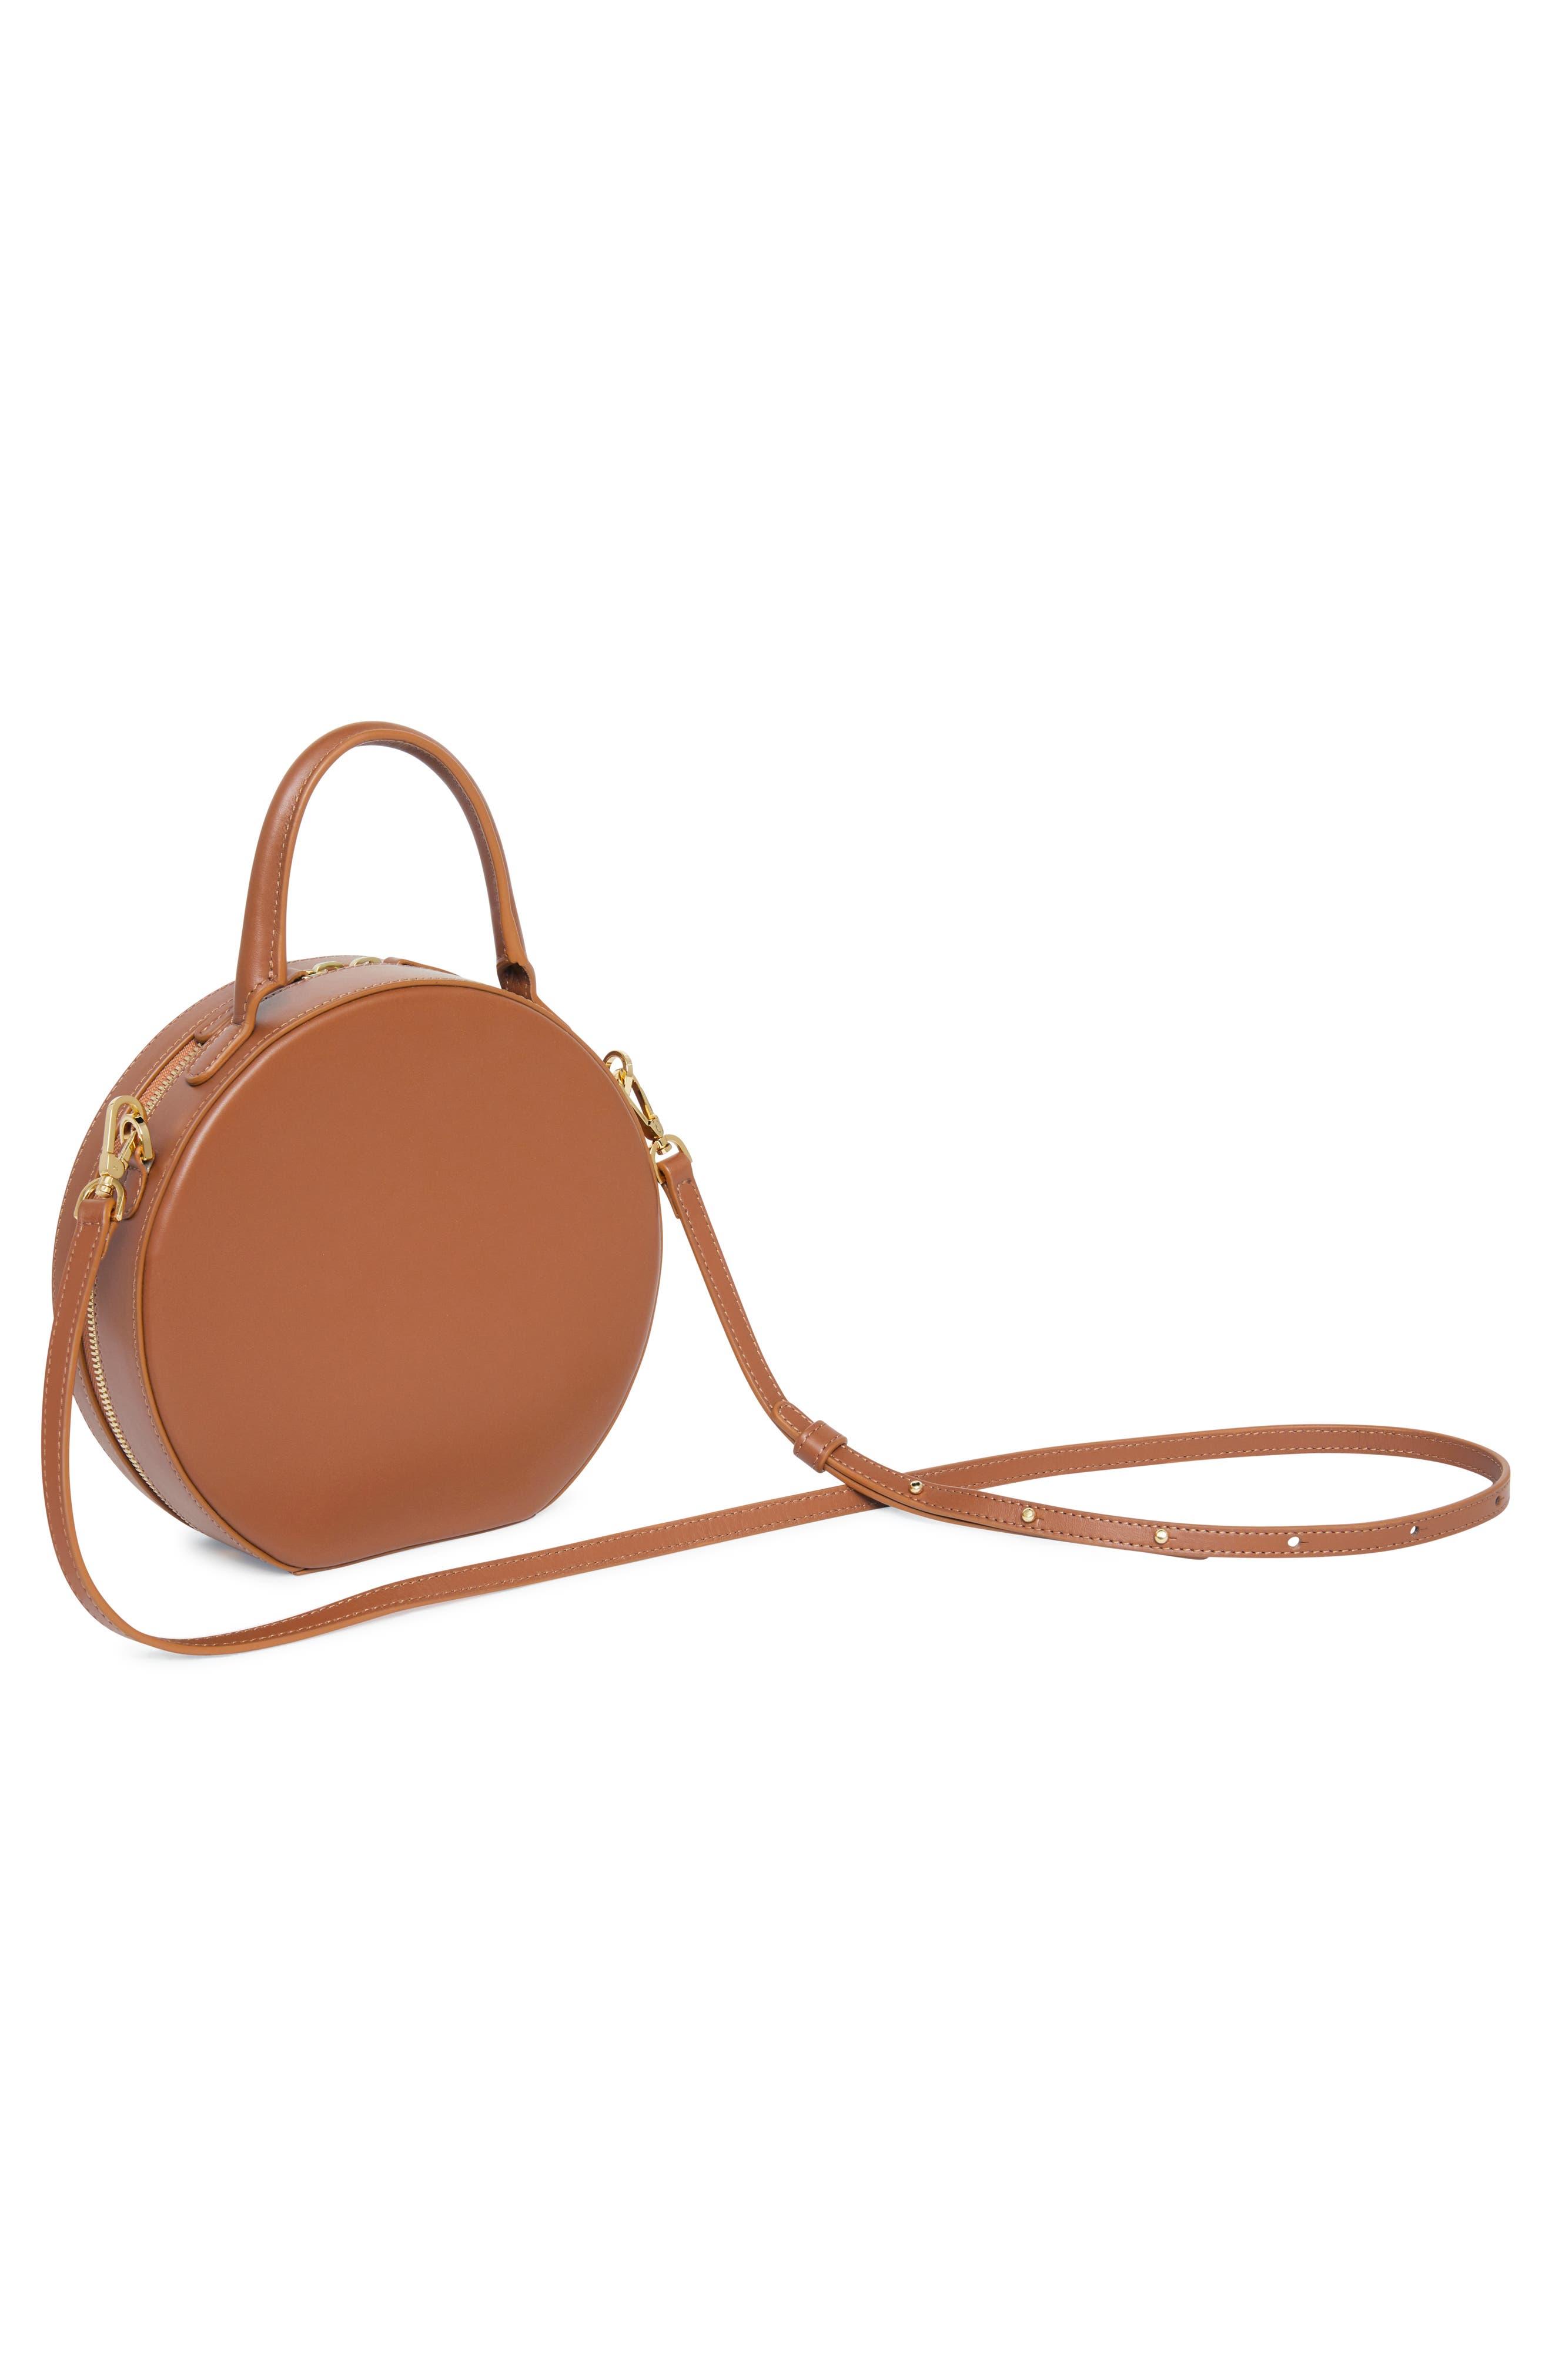 Leather Circle Crossbody Bag,                             Alternate thumbnail 4, color,                             SADDLE